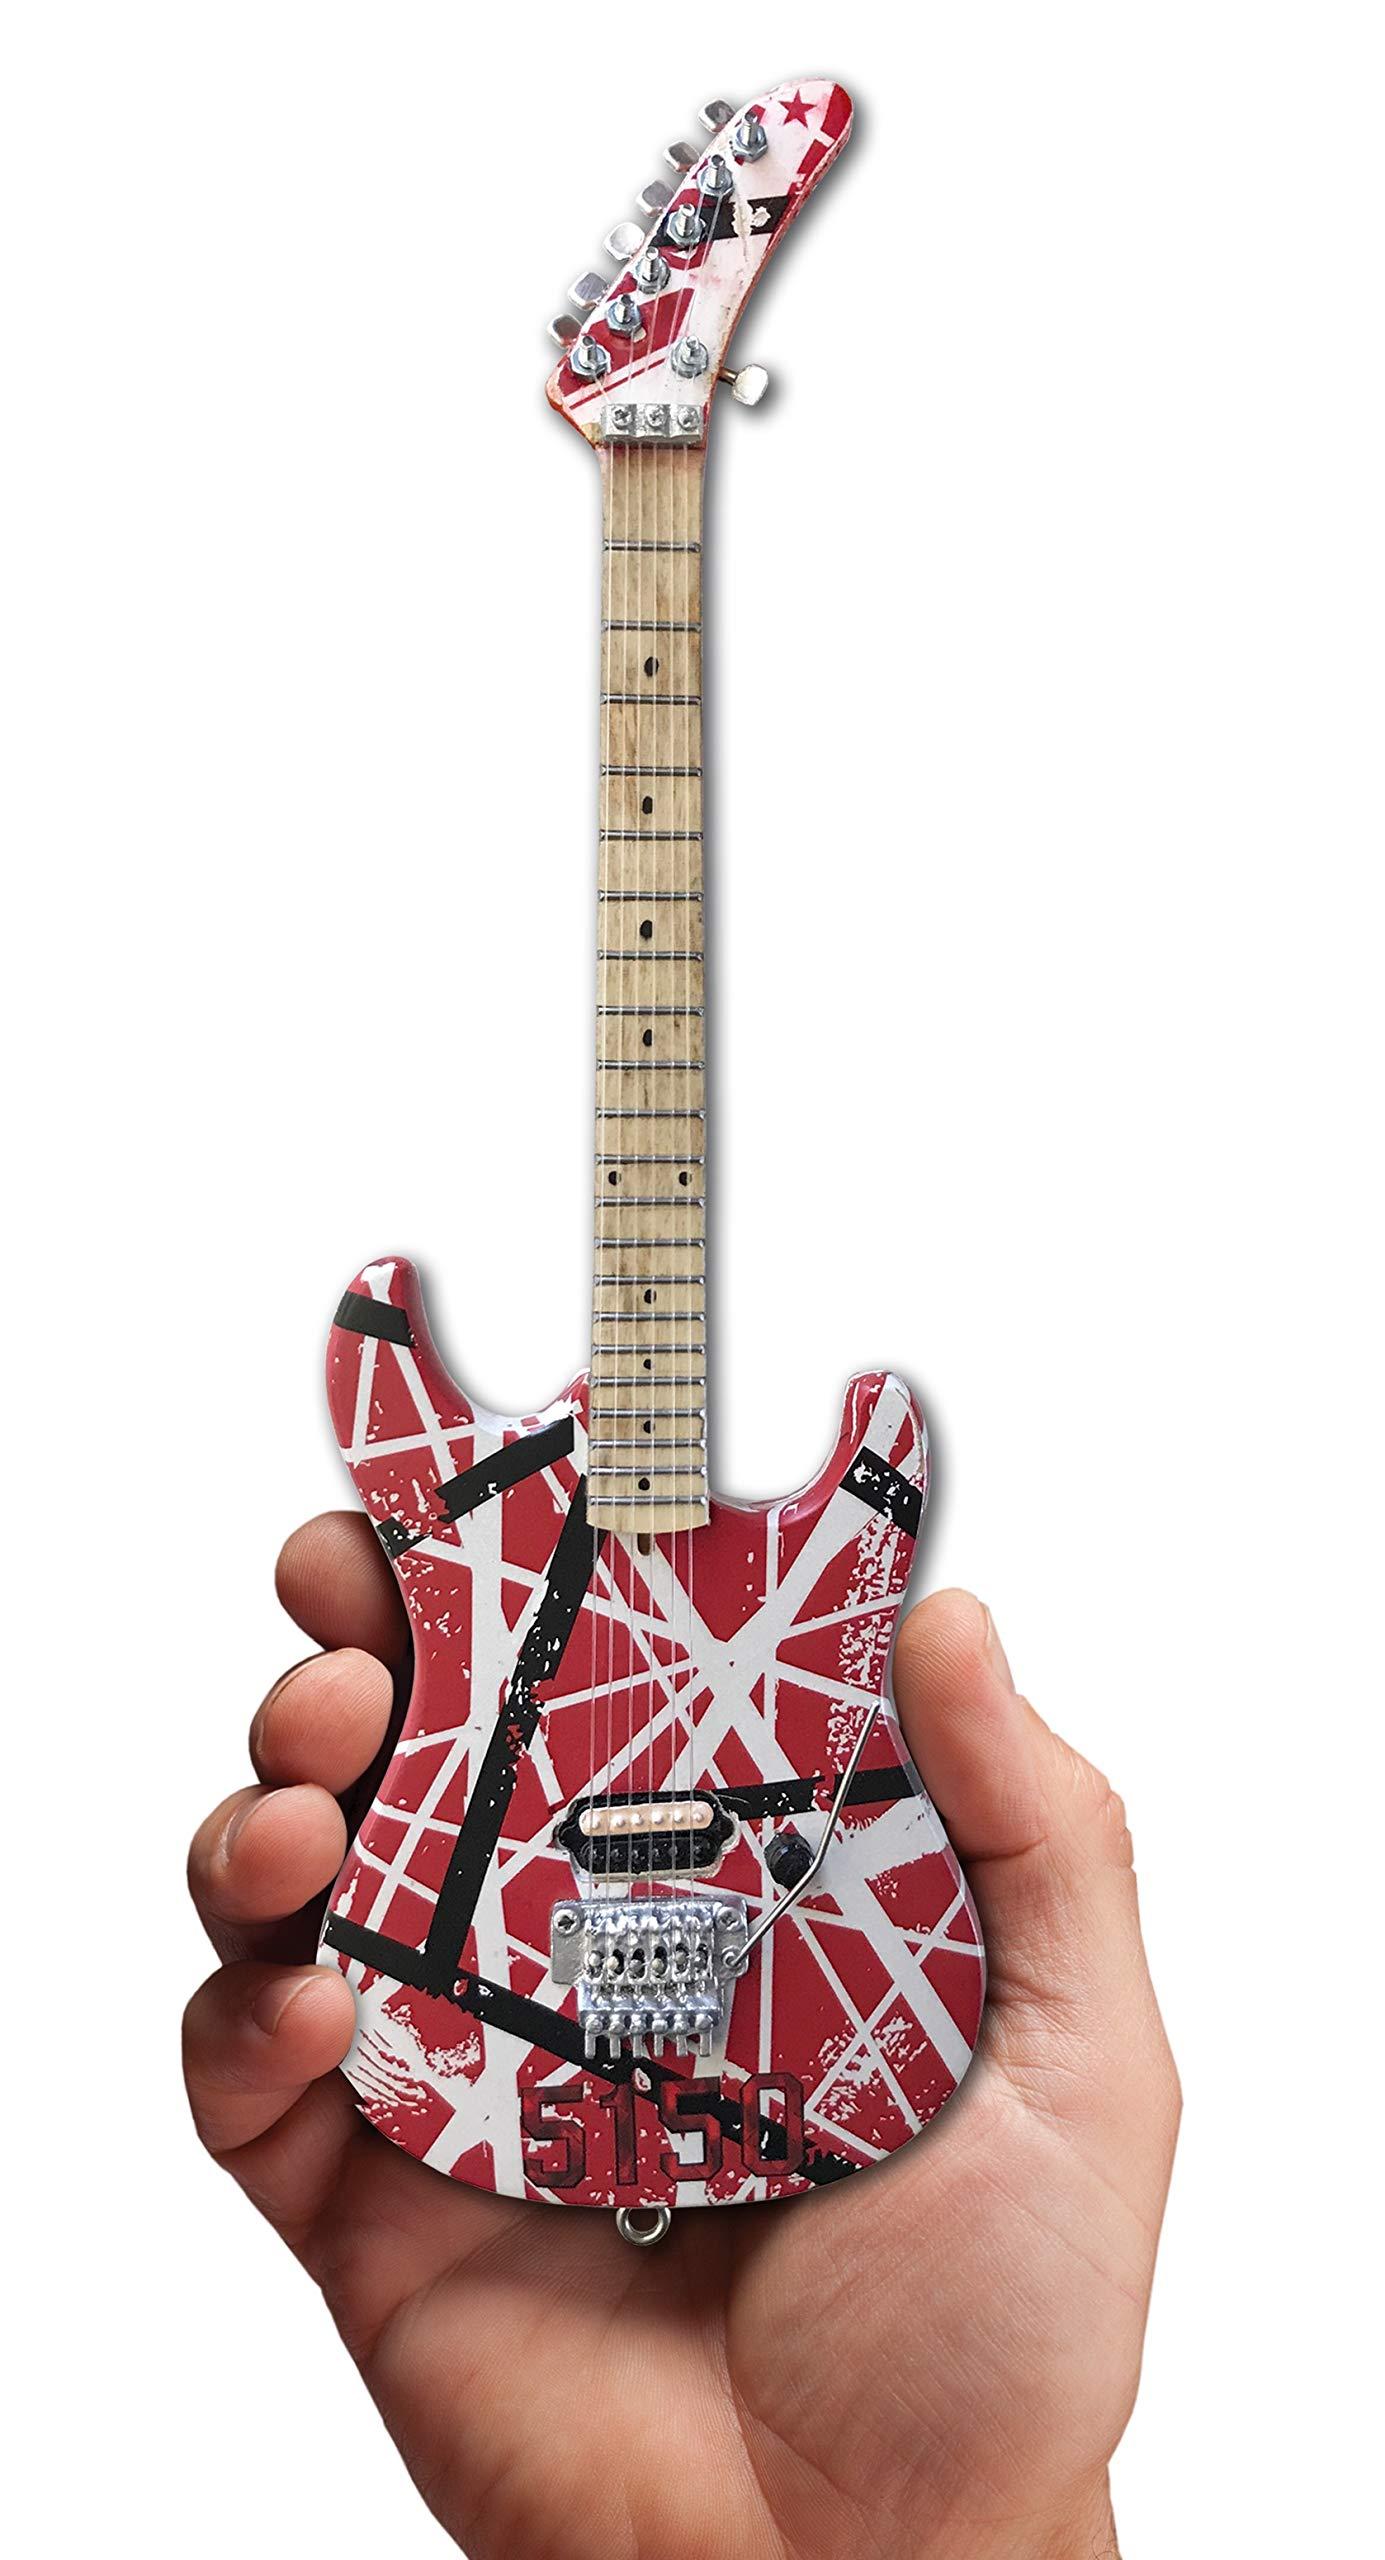 FanMerch Guitar EVH 5150 Eddie Van Halen - Réplica de Guitarra ...